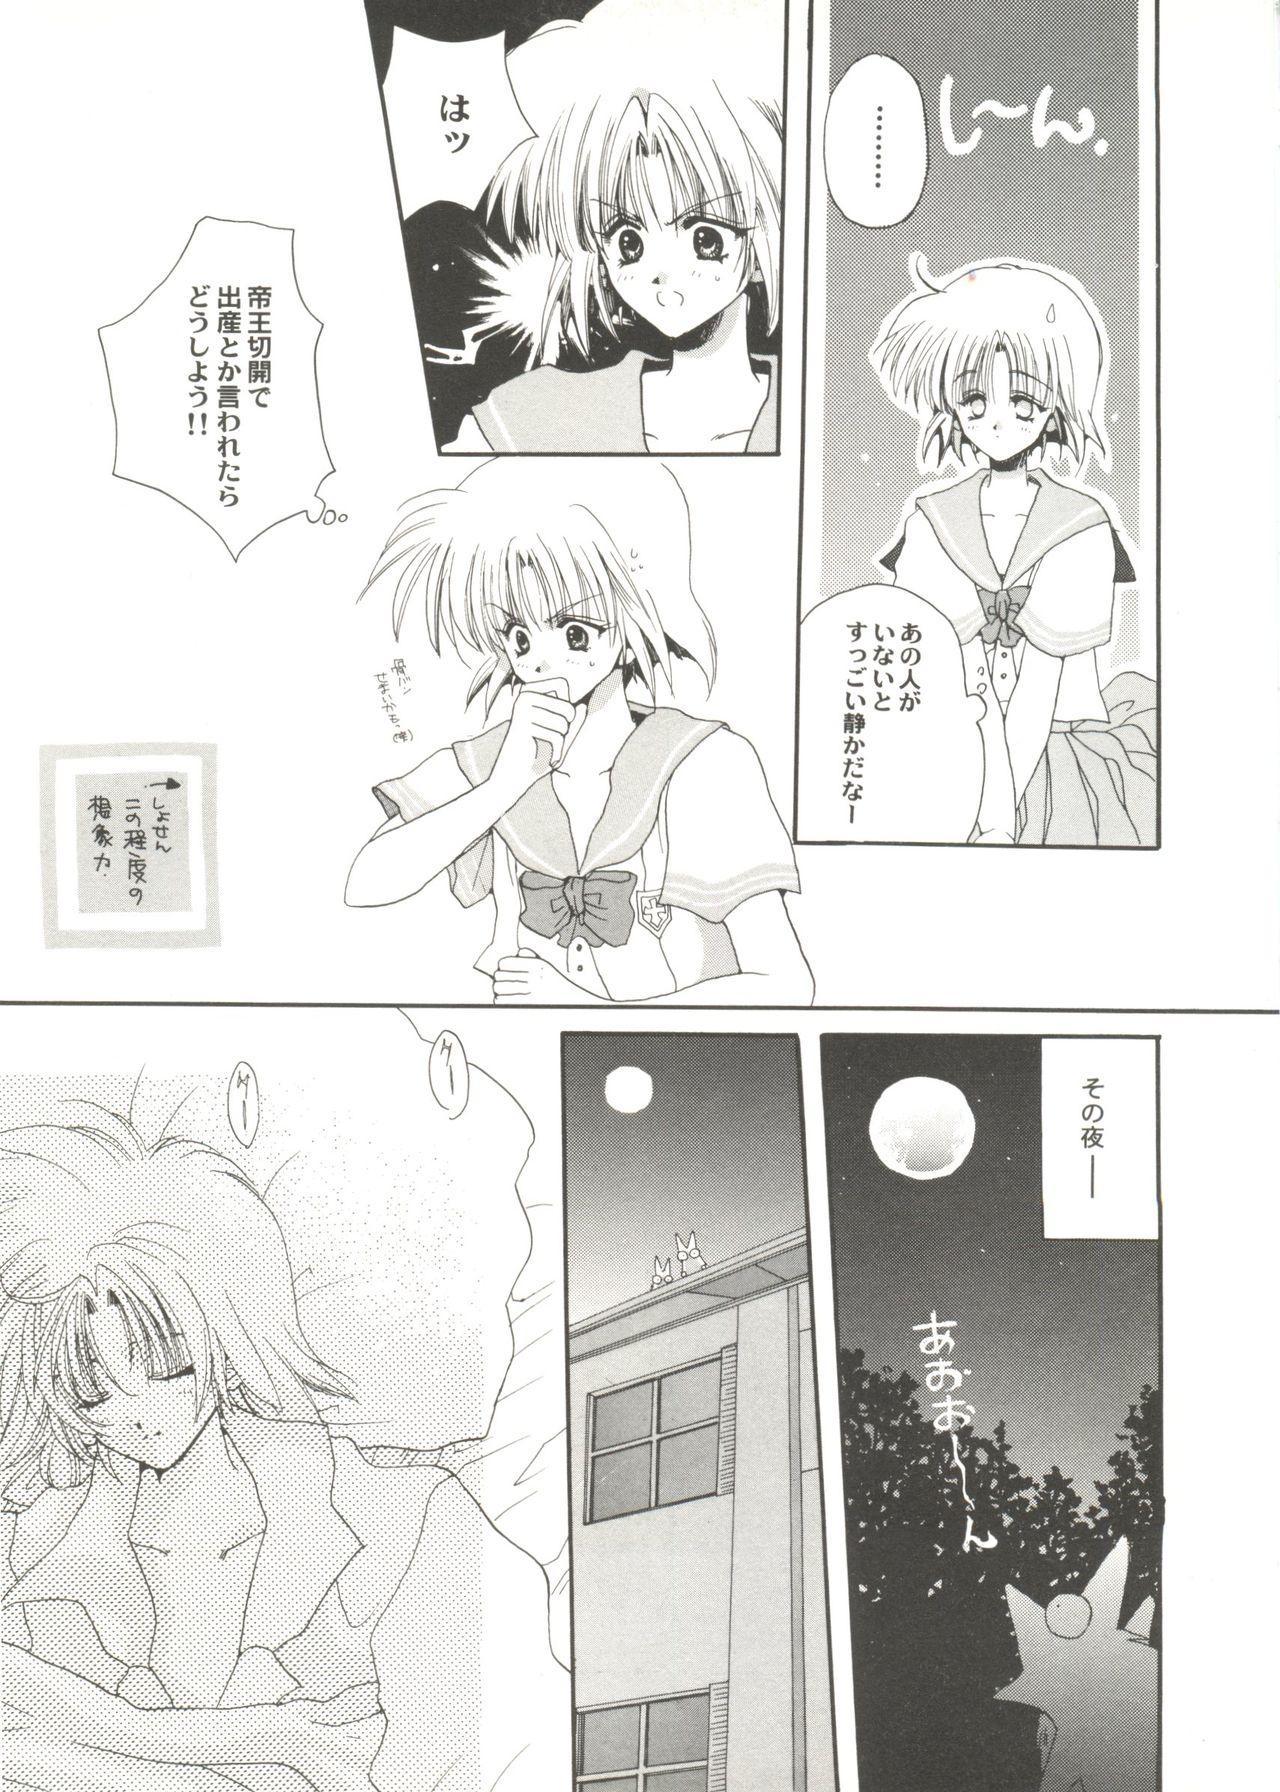 Bishoujo Doujin Peach Club - Pretty Gal's Fanzine Peach Club 9 38